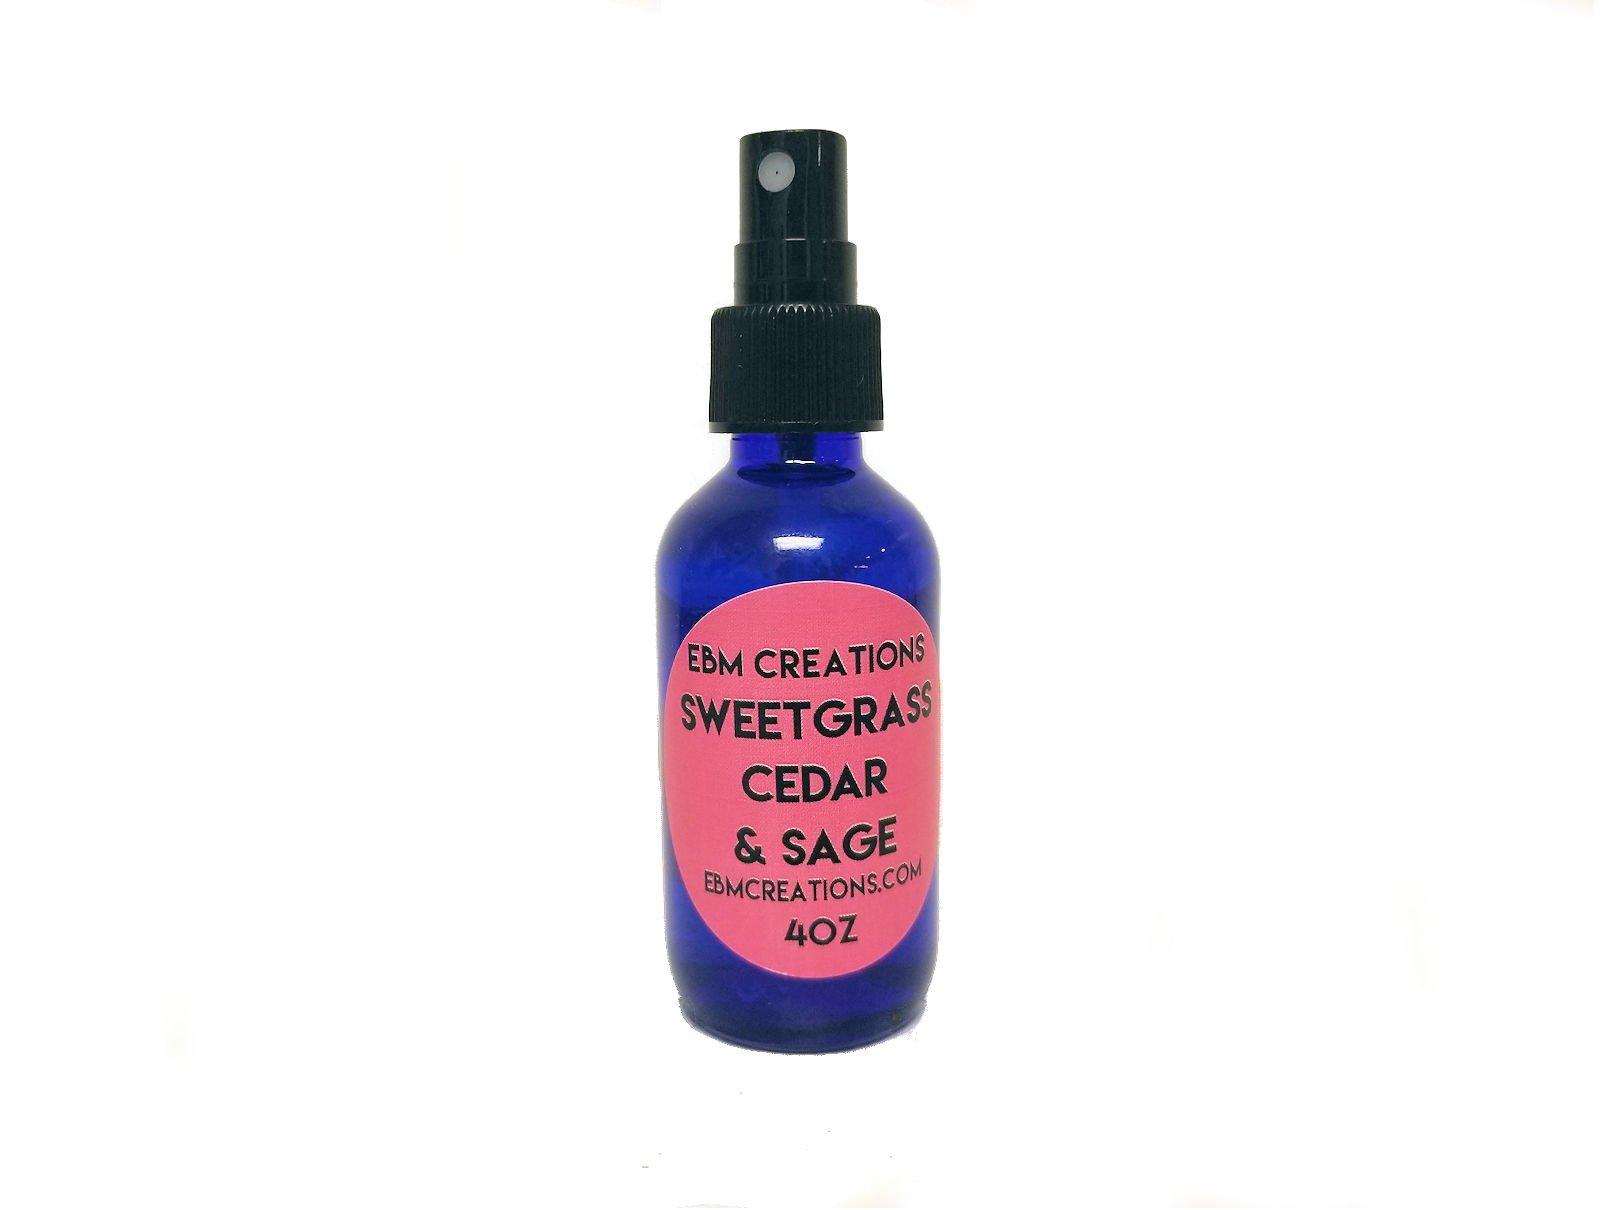 Sweetgrass Cedar & Sage Smudge Spray - 4 oz Bottle